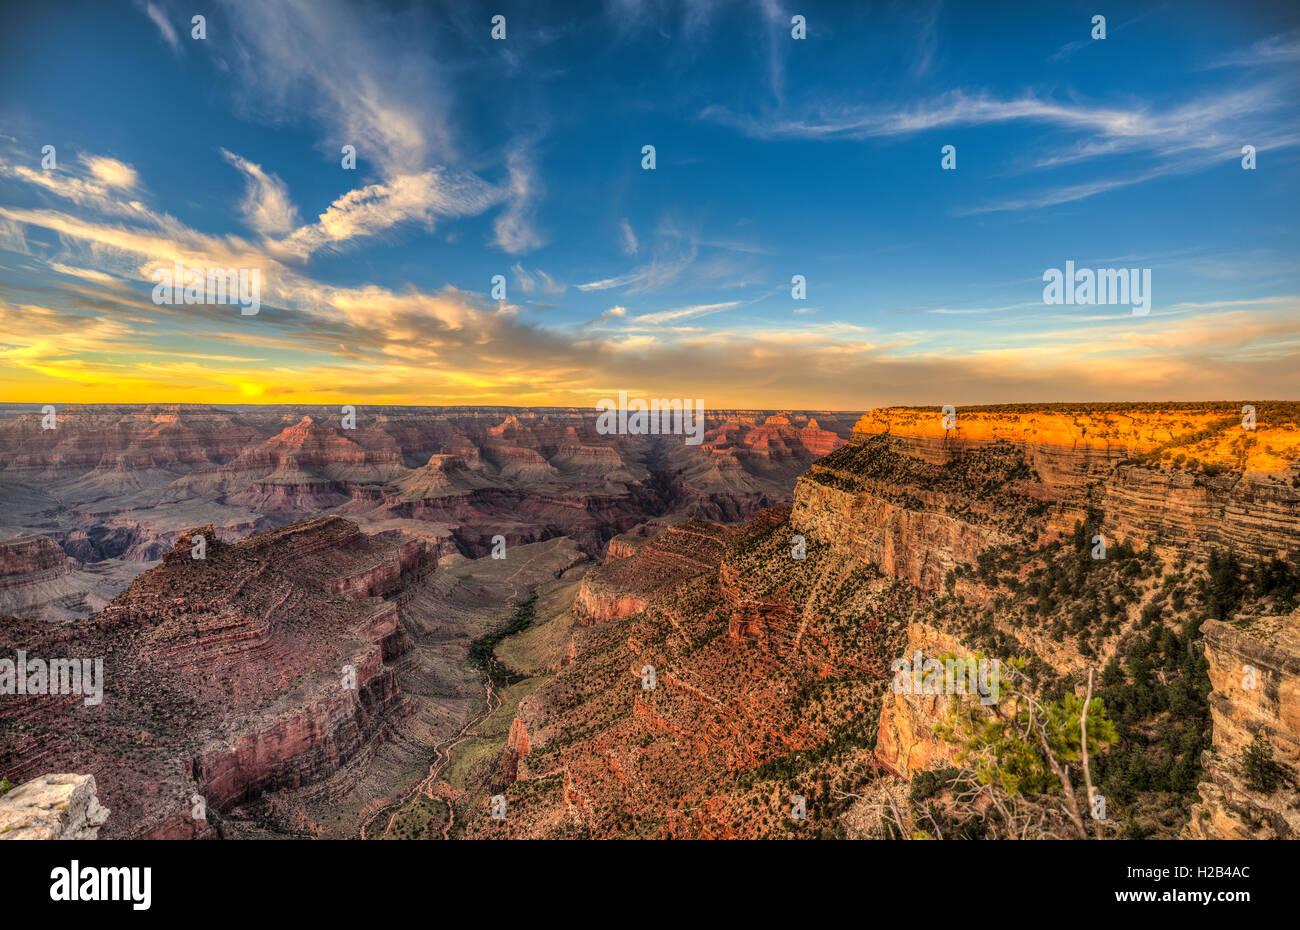 Sunset over Grand Canyon, Grand Canyon National Park, South Rim, Arizona, USA - Stock Image